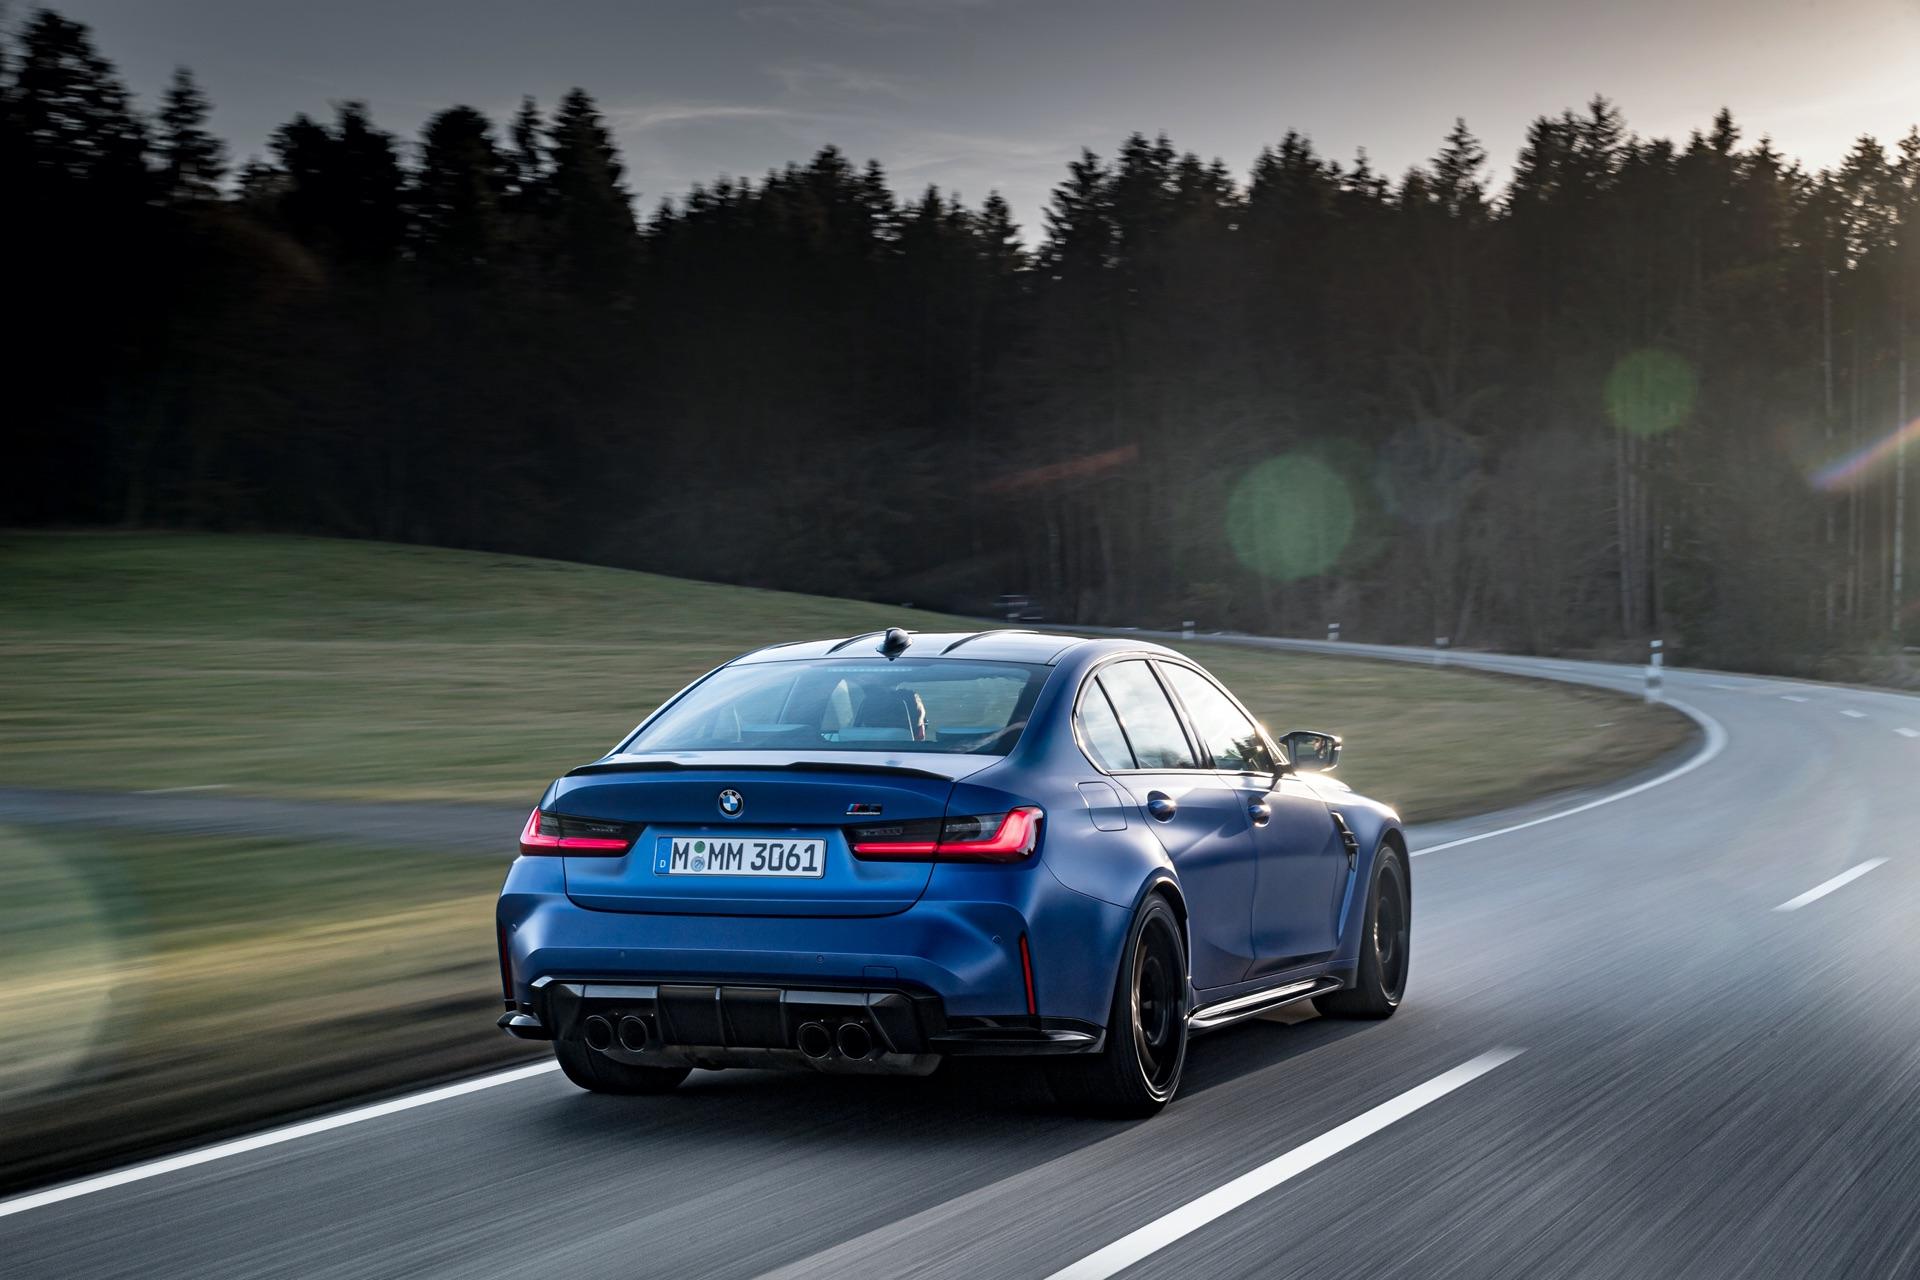 Portimao Blue BMW G80 M3 rear lights